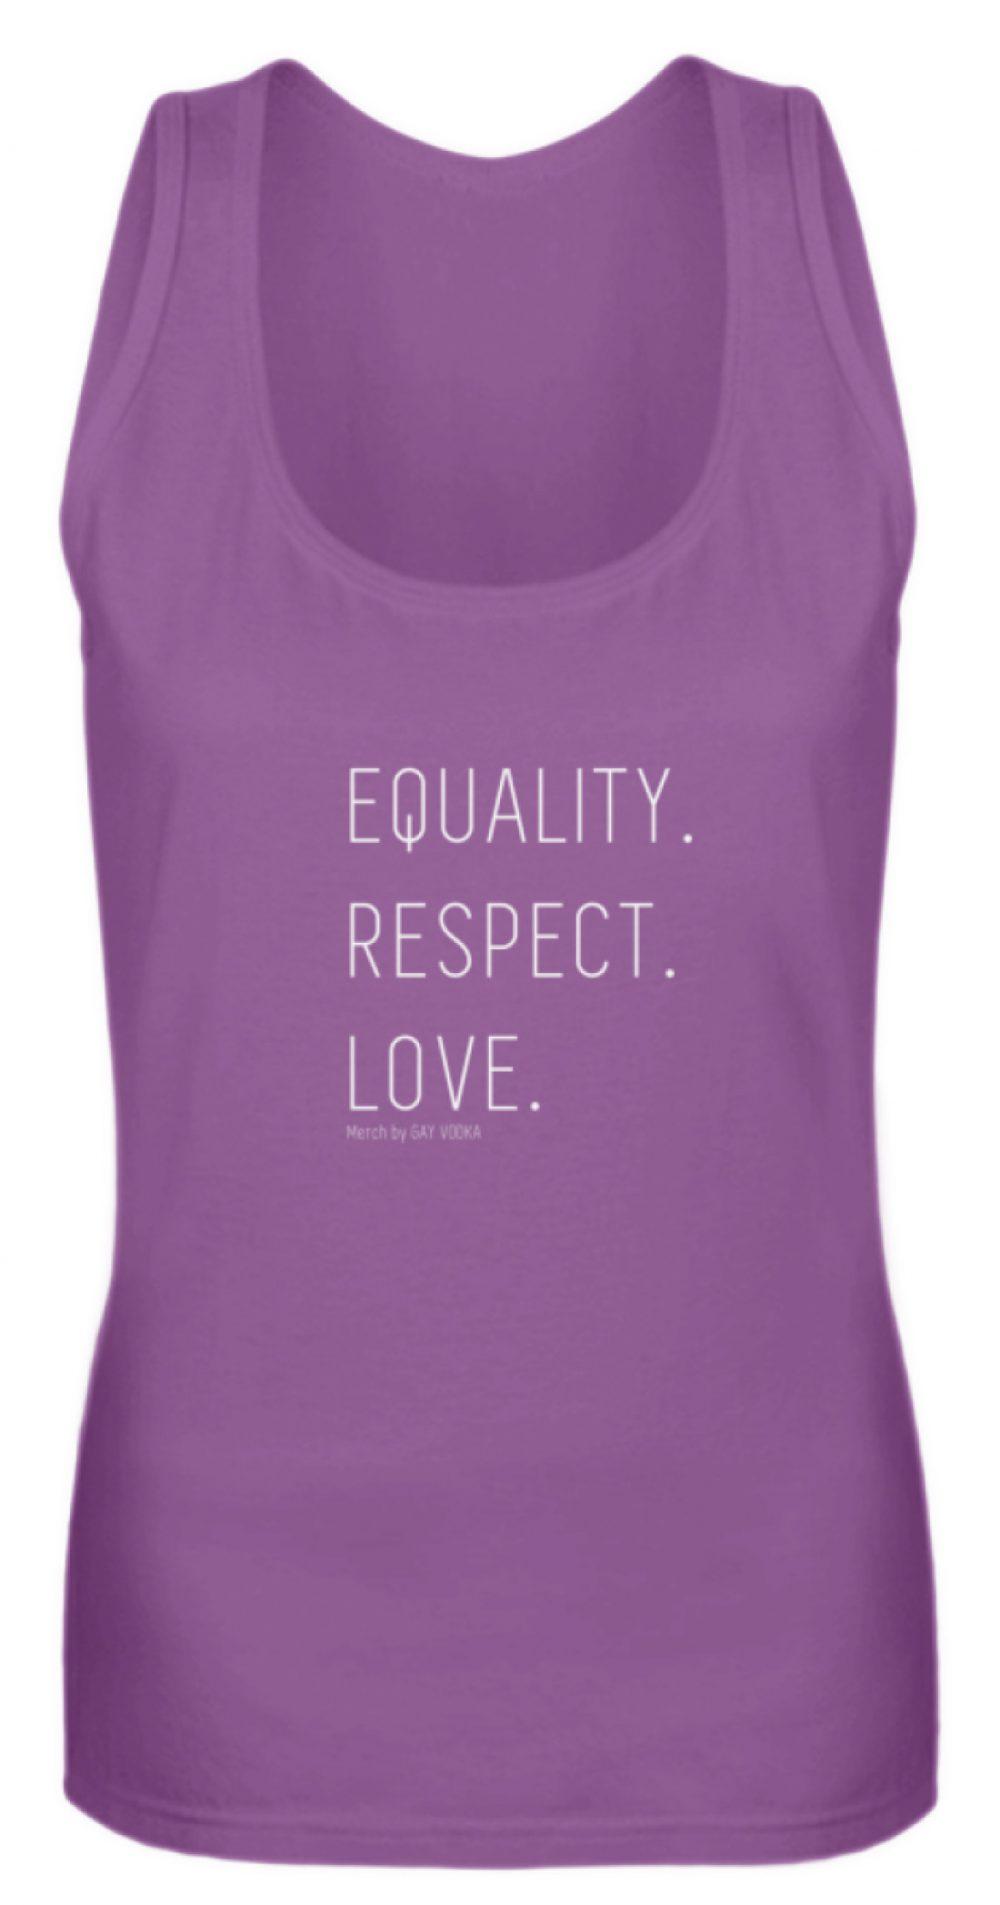 EQUALITY. RESPECT. LOVE. - Frauen Tanktop-31